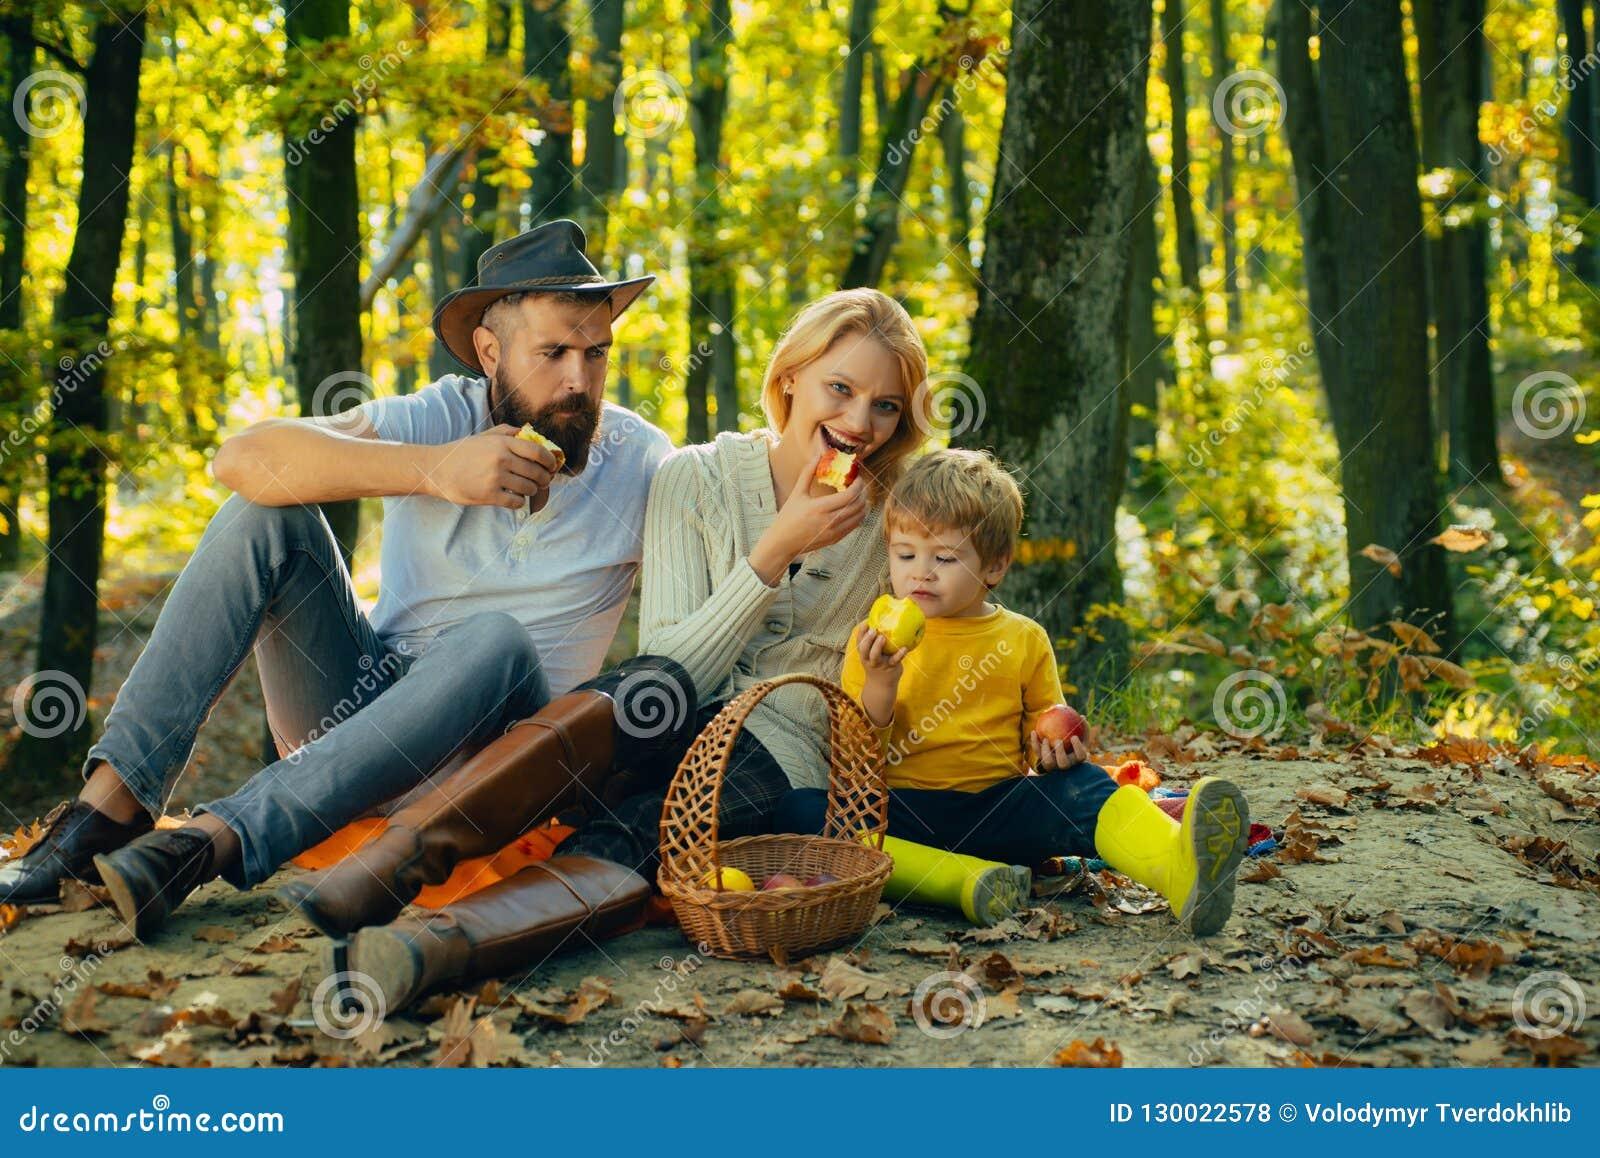 Autumn Family Camping no parque e na maçã comer Povos ativos e conceito de família feliz outdoors Acampamento do outono